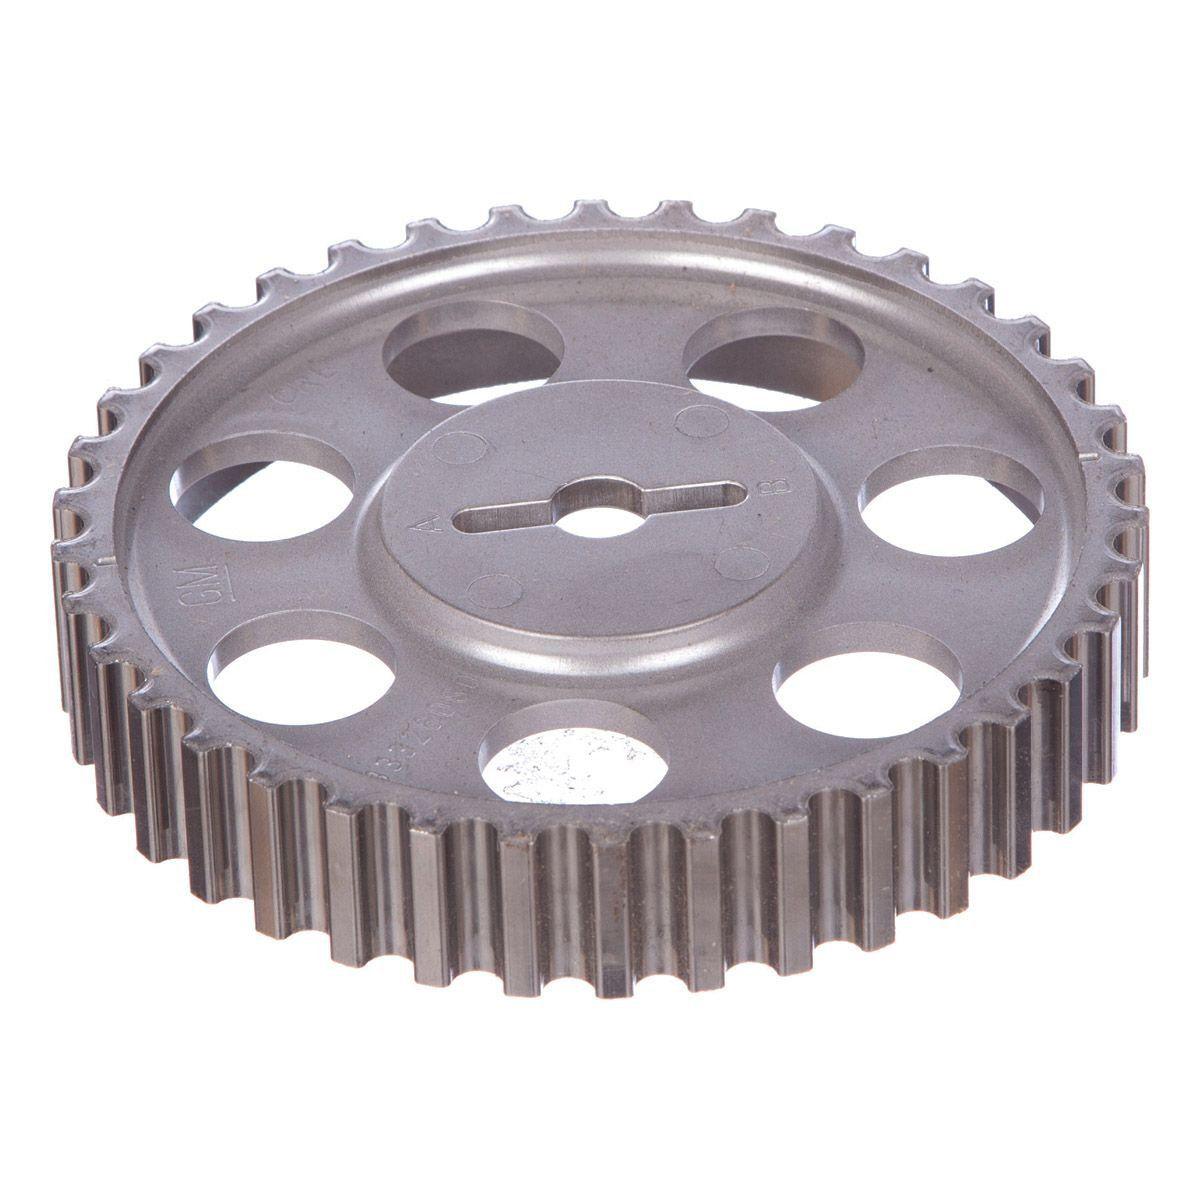 Engrenagem comando de valvulas motor 1.4 - Agile de 2010 a 2014